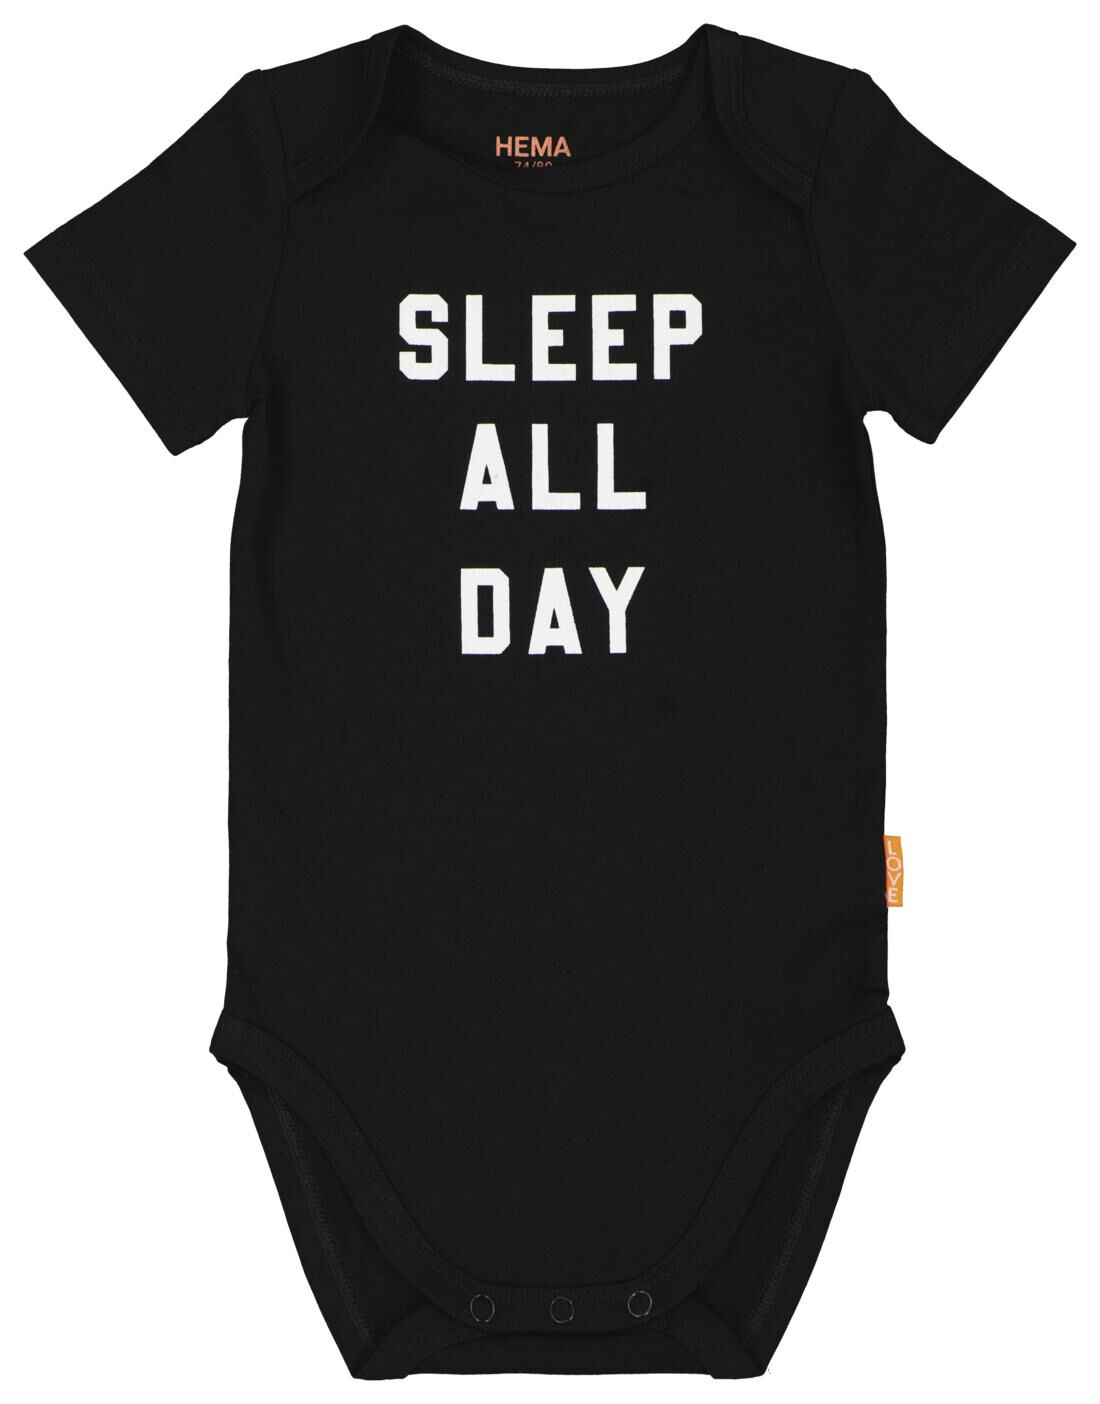 HEMA Romper Katoen Stretch Sleep All Day Zwart (zwart)